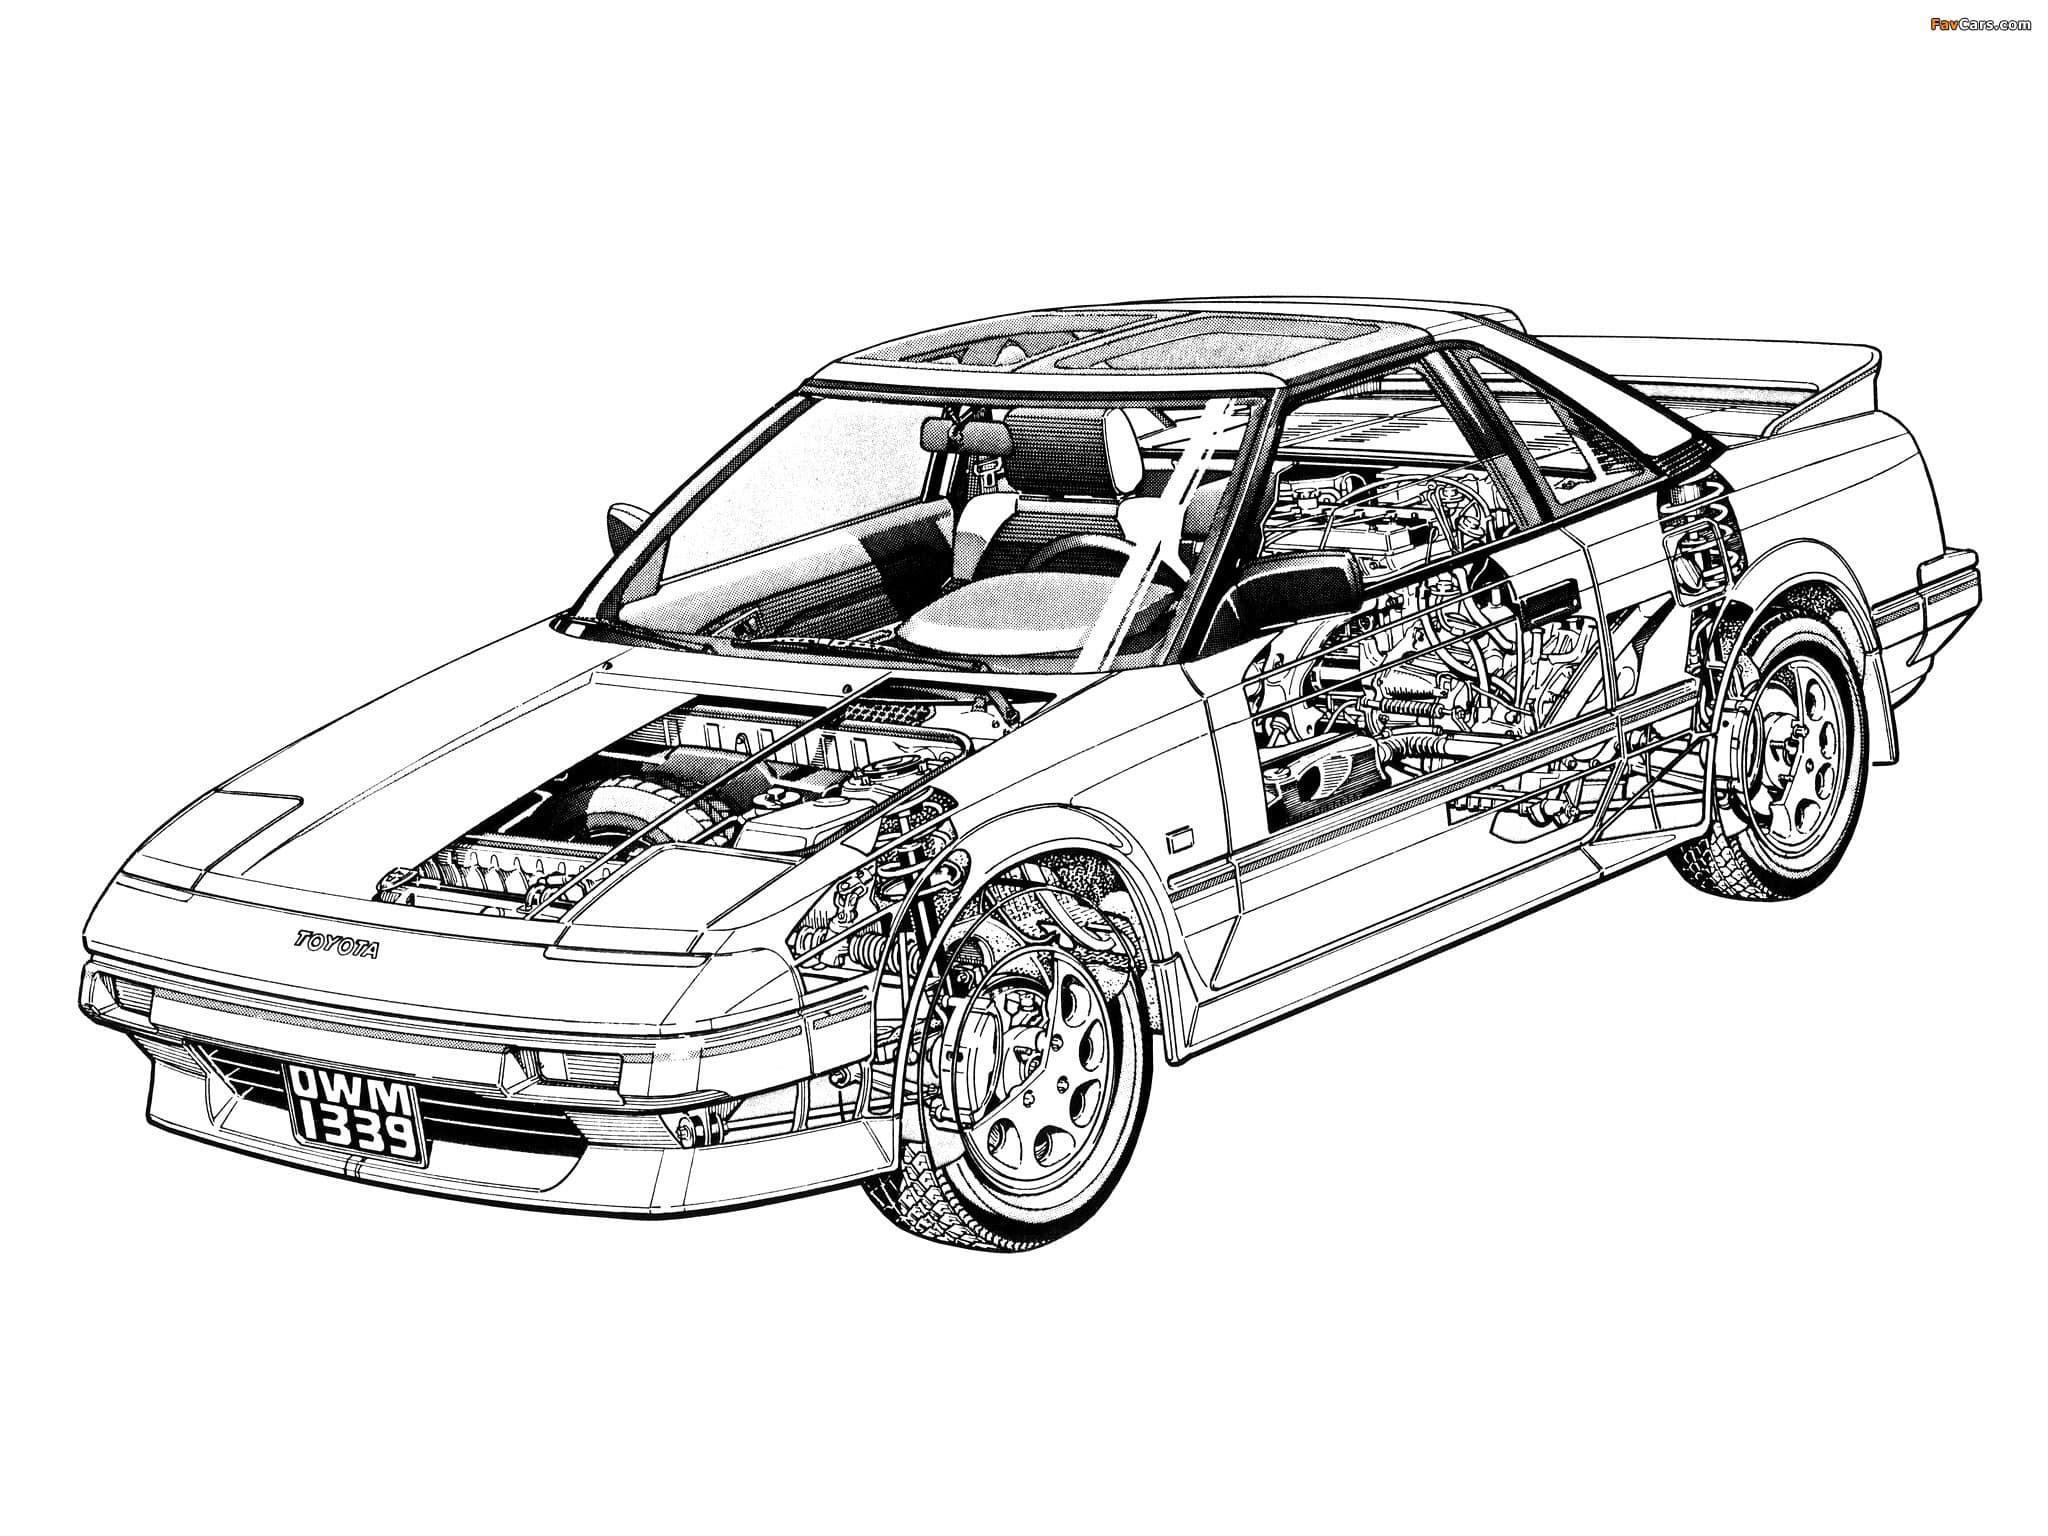 Toyota Mr2 Aw11 Thingscutinhalf